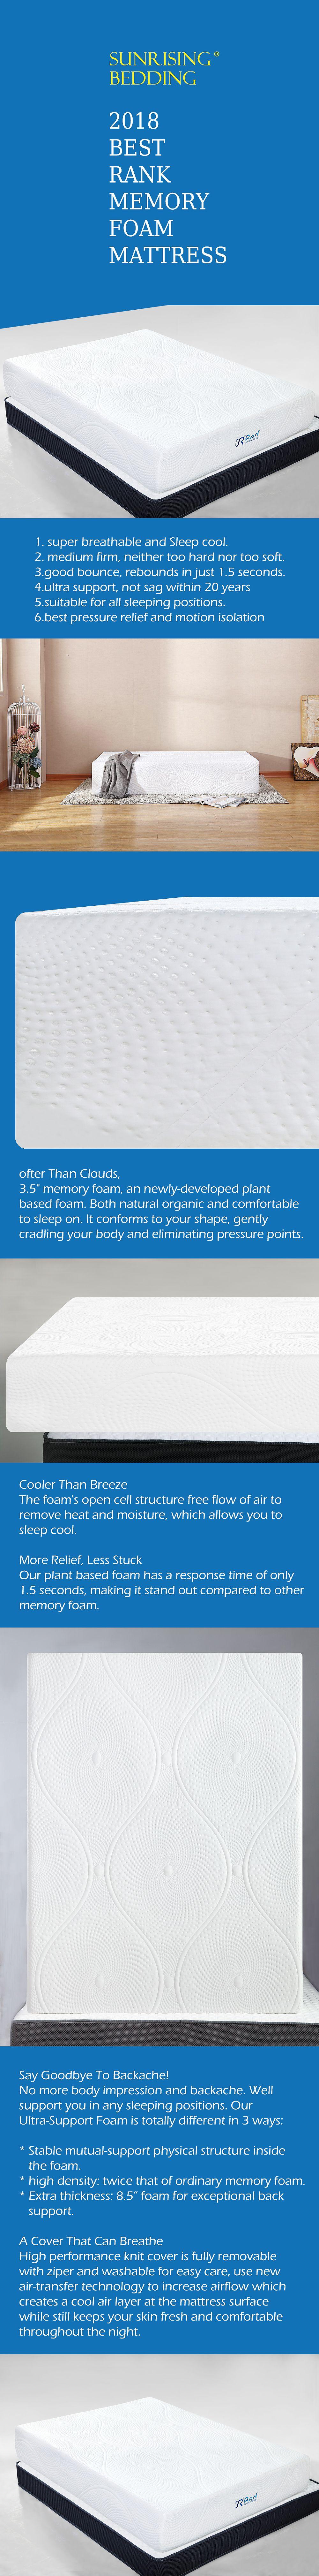 made to mattresses buy order techcrunch mattress online sell bed sleep million raises best helix time